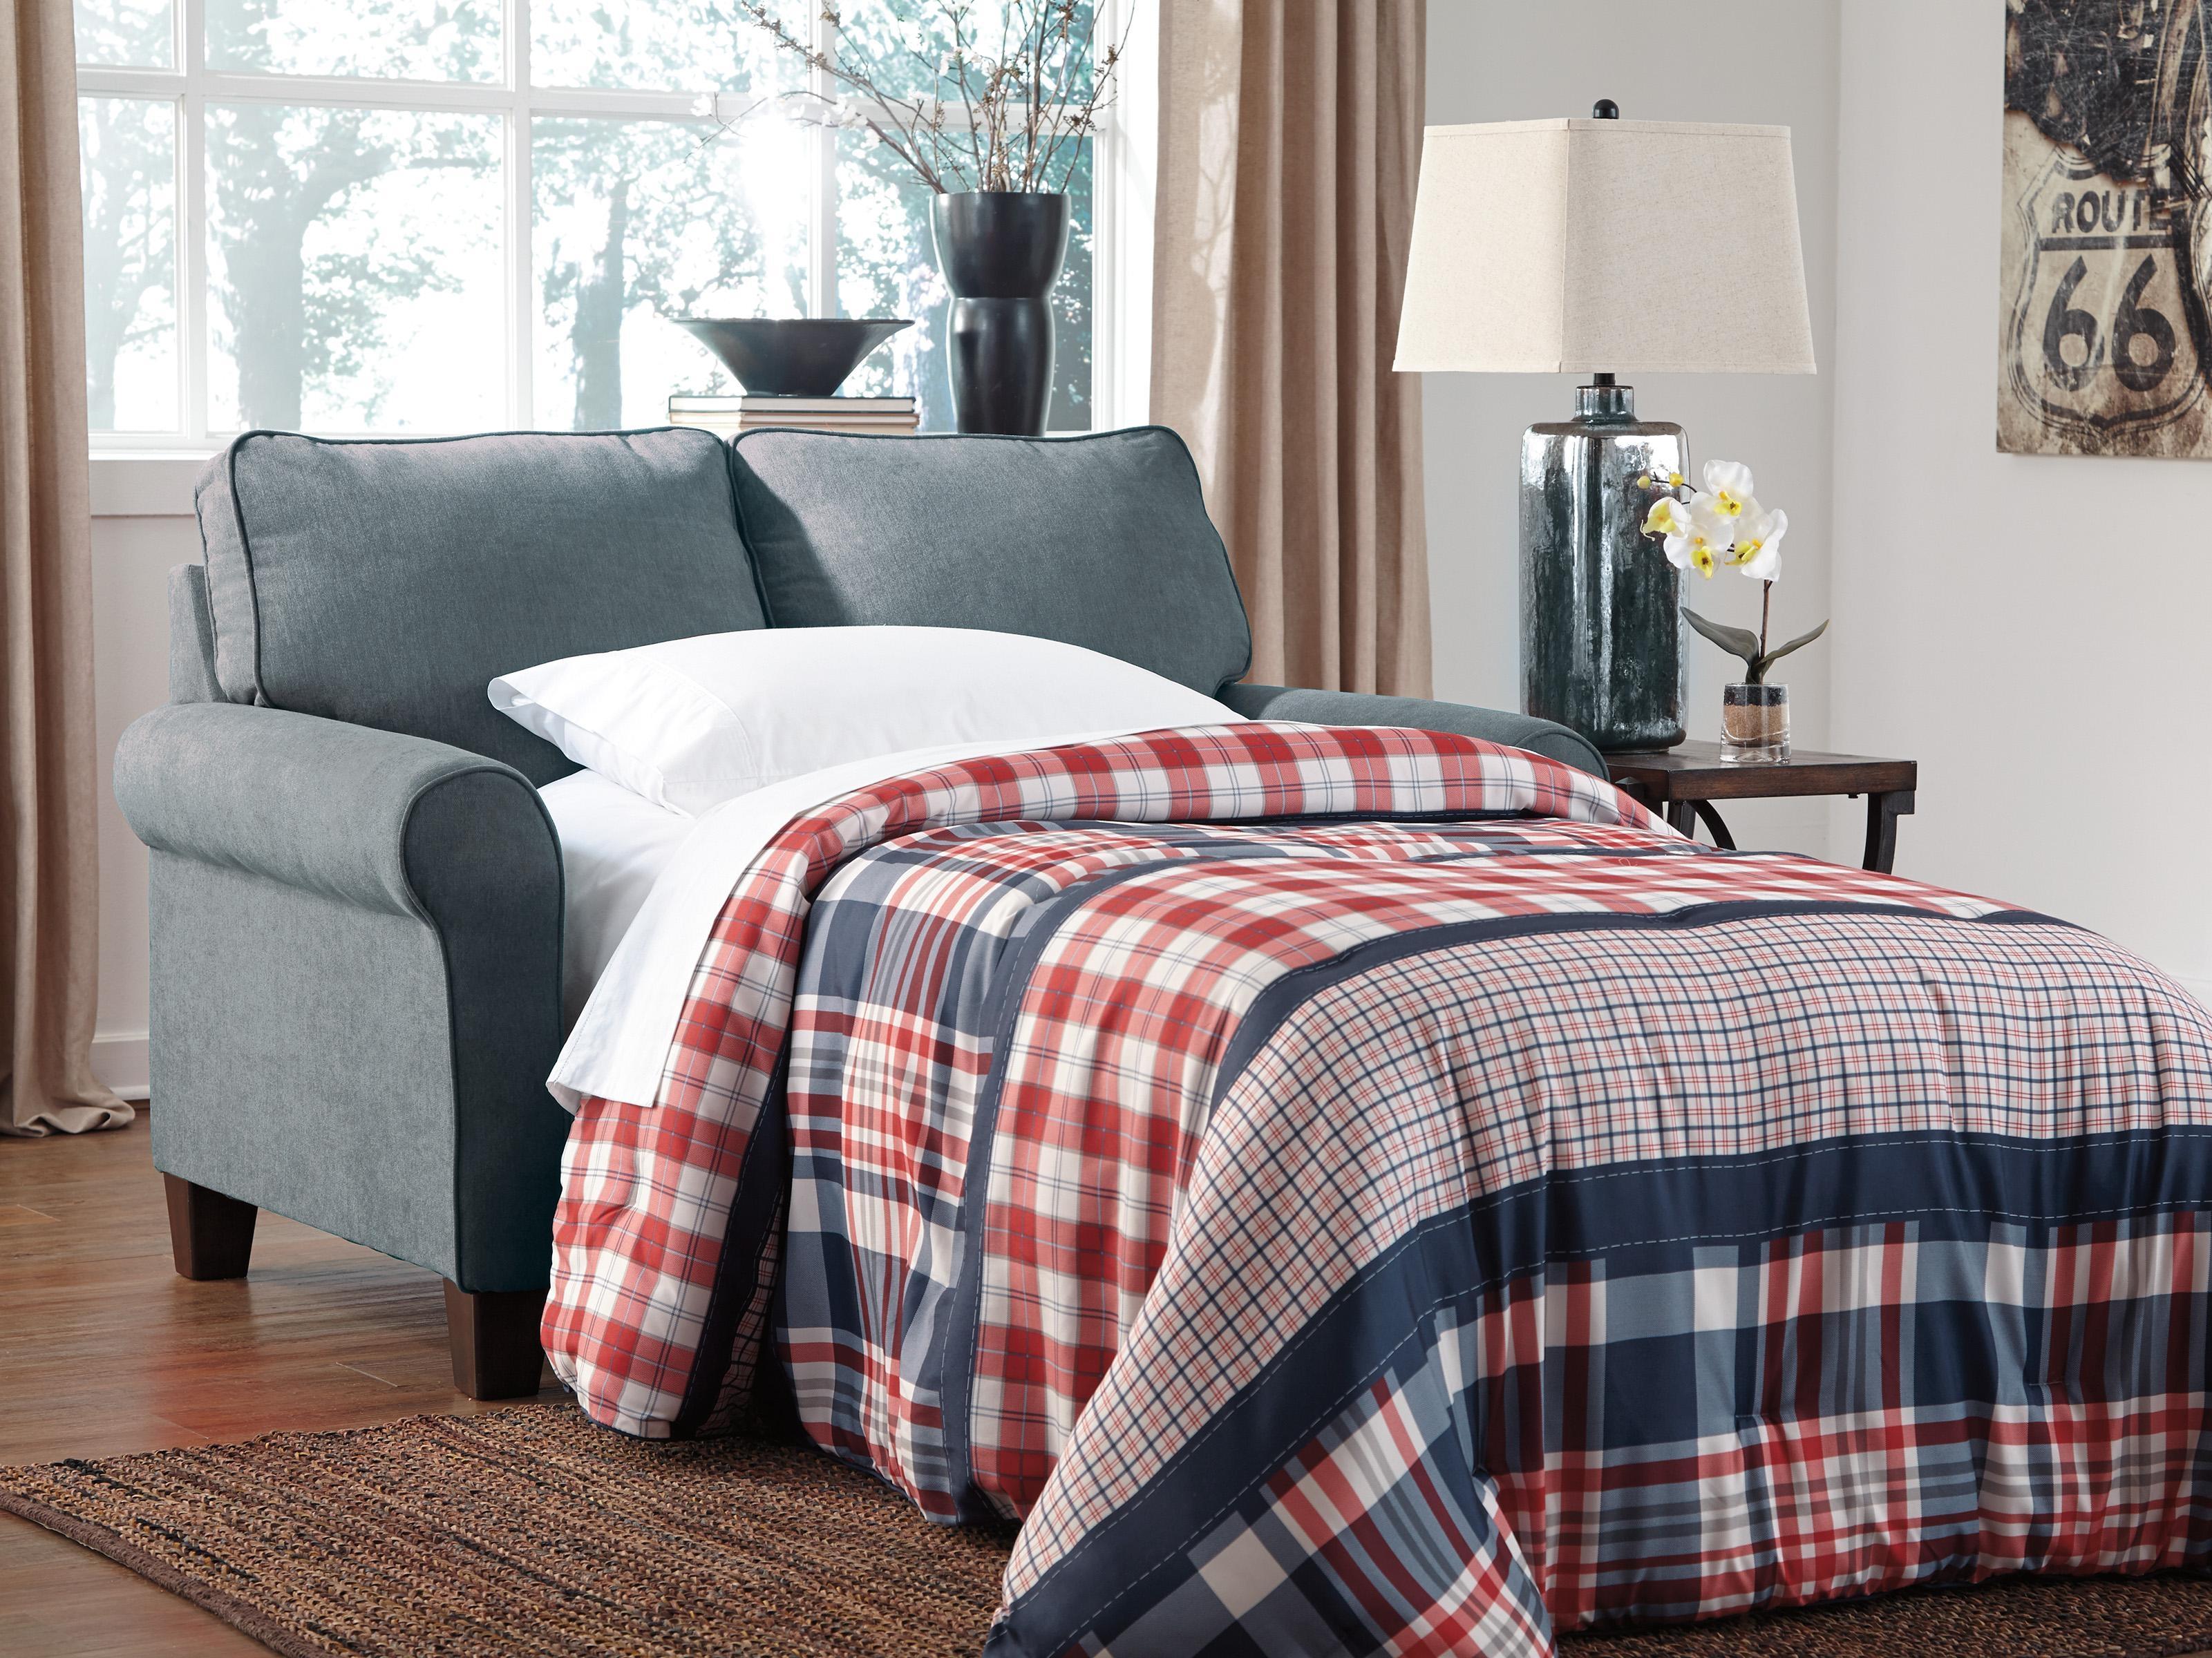 Denim Living Room Furniture With Denim Loveseat Review | Home Pertaining To Denim Loveseats (Image 9 of 20)